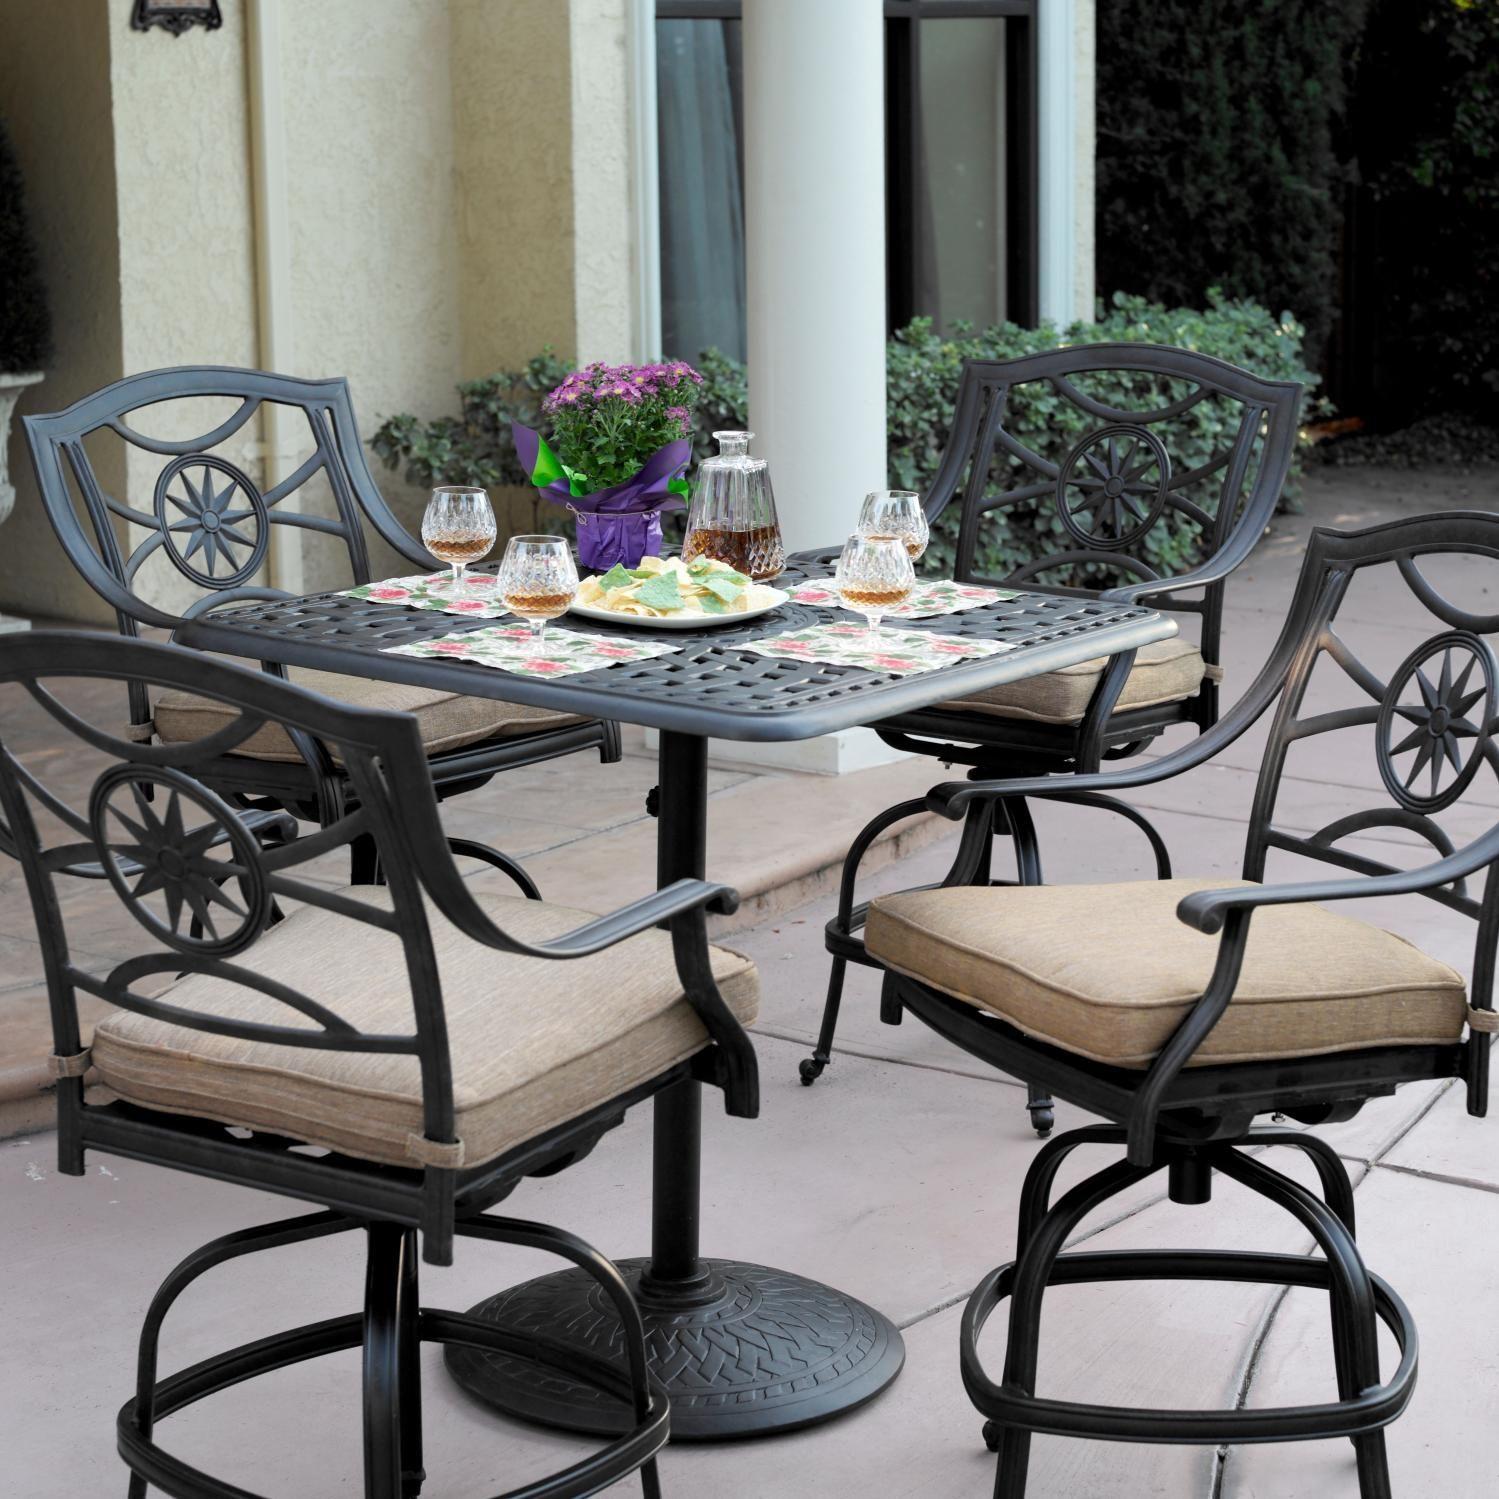 Phenomenal Darlee Ten Star 5 Piece Cast Aluminum Counter Height Patio Spiritservingveterans Wood Chair Design Ideas Spiritservingveteransorg